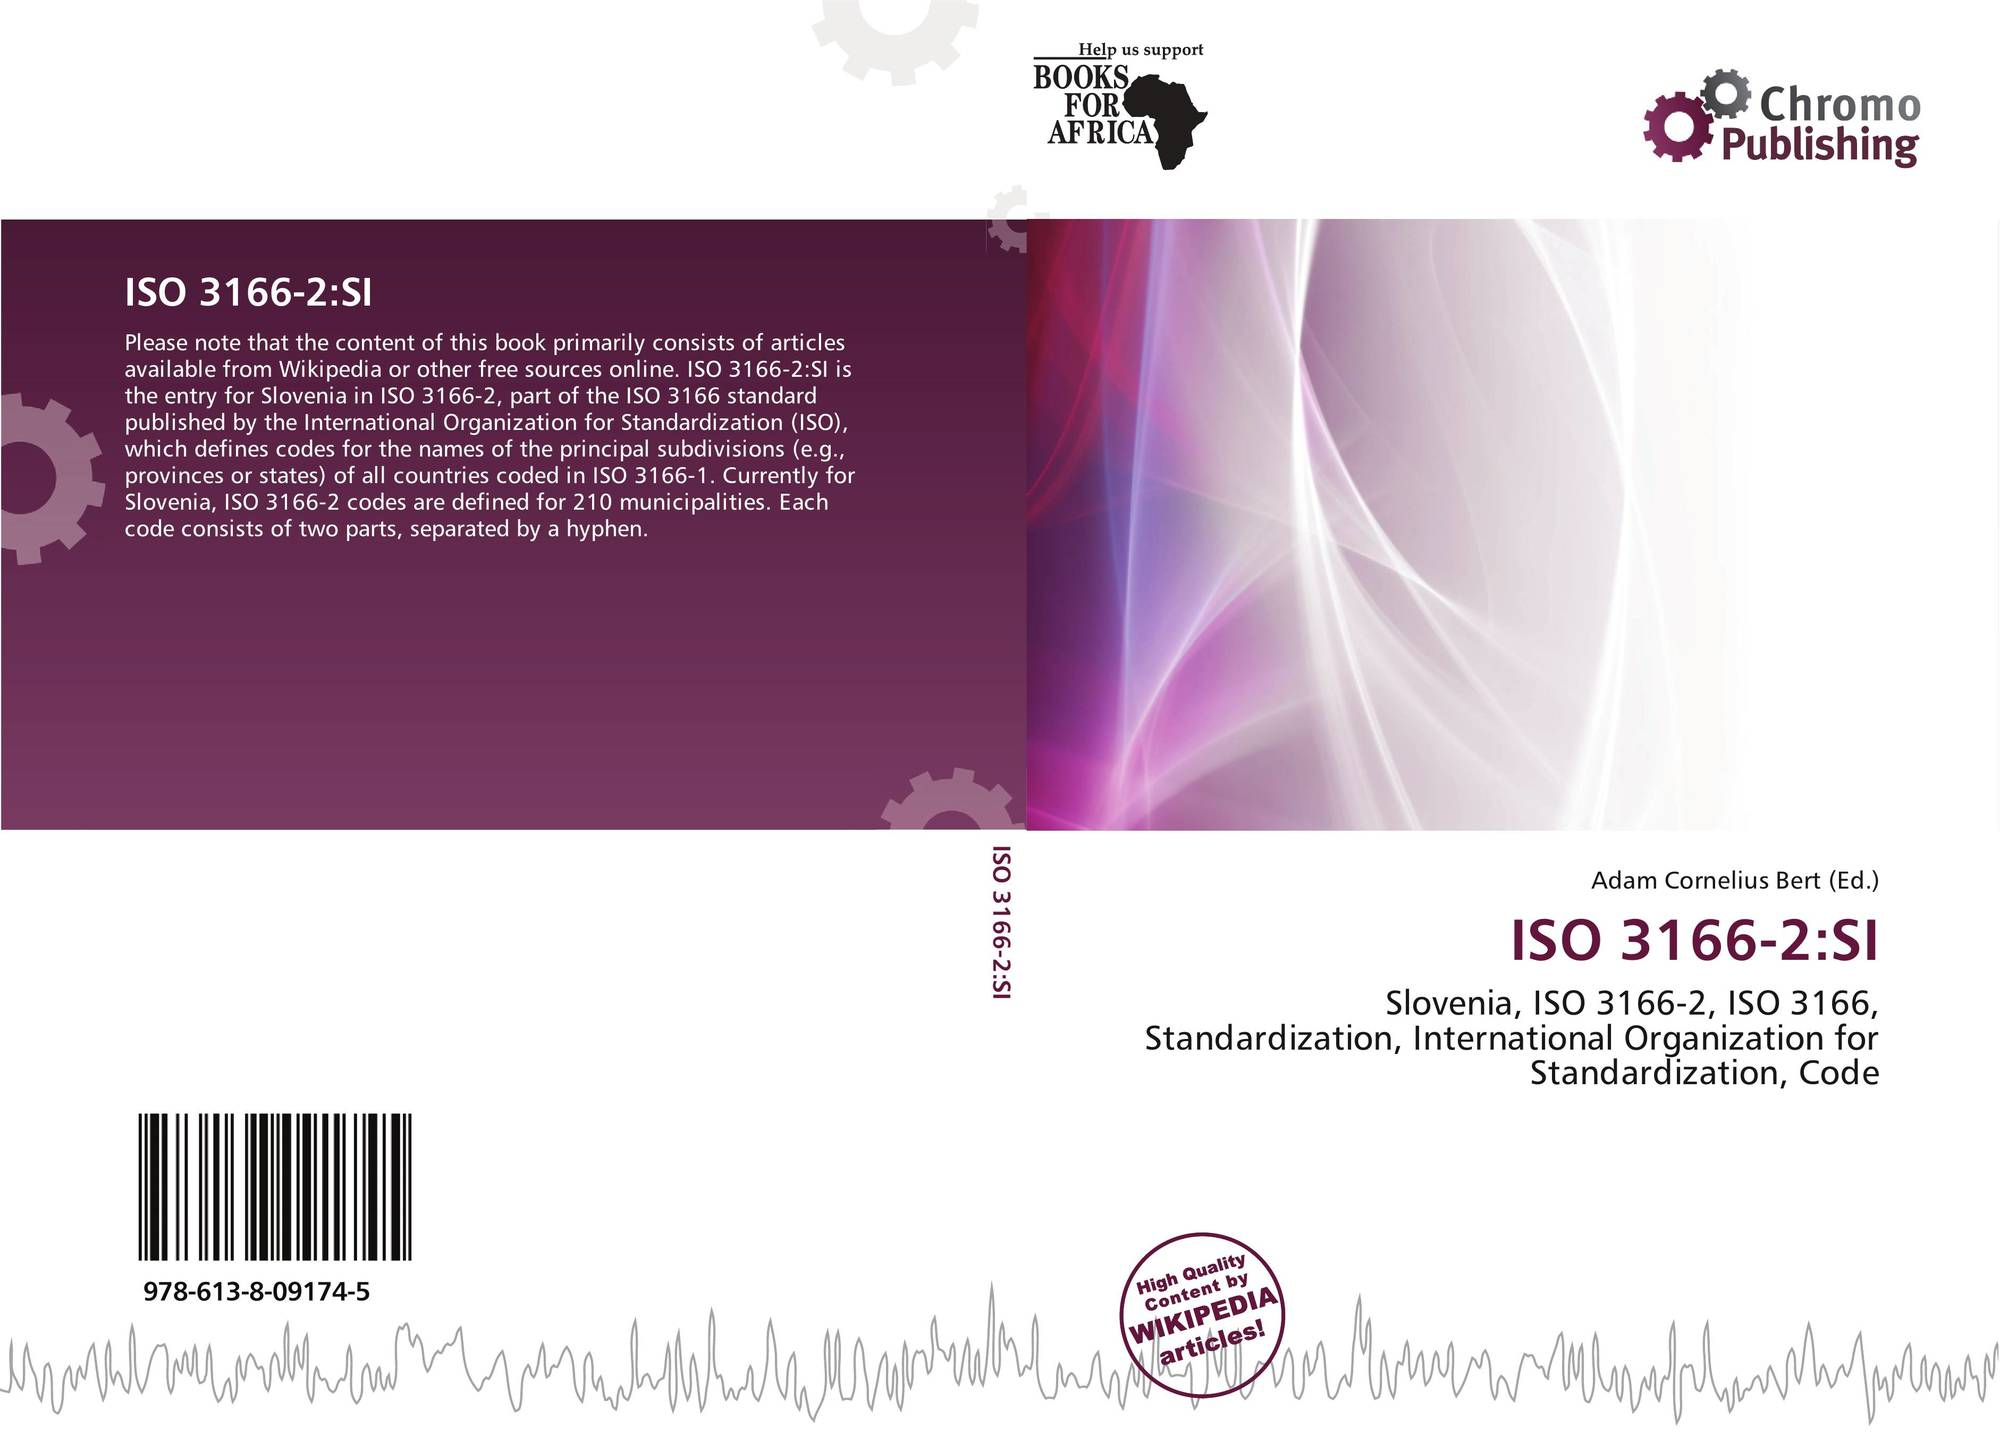 ISO 3166-2:SI, 978-613-8-09174-5, 6138091744 ,9786138091745